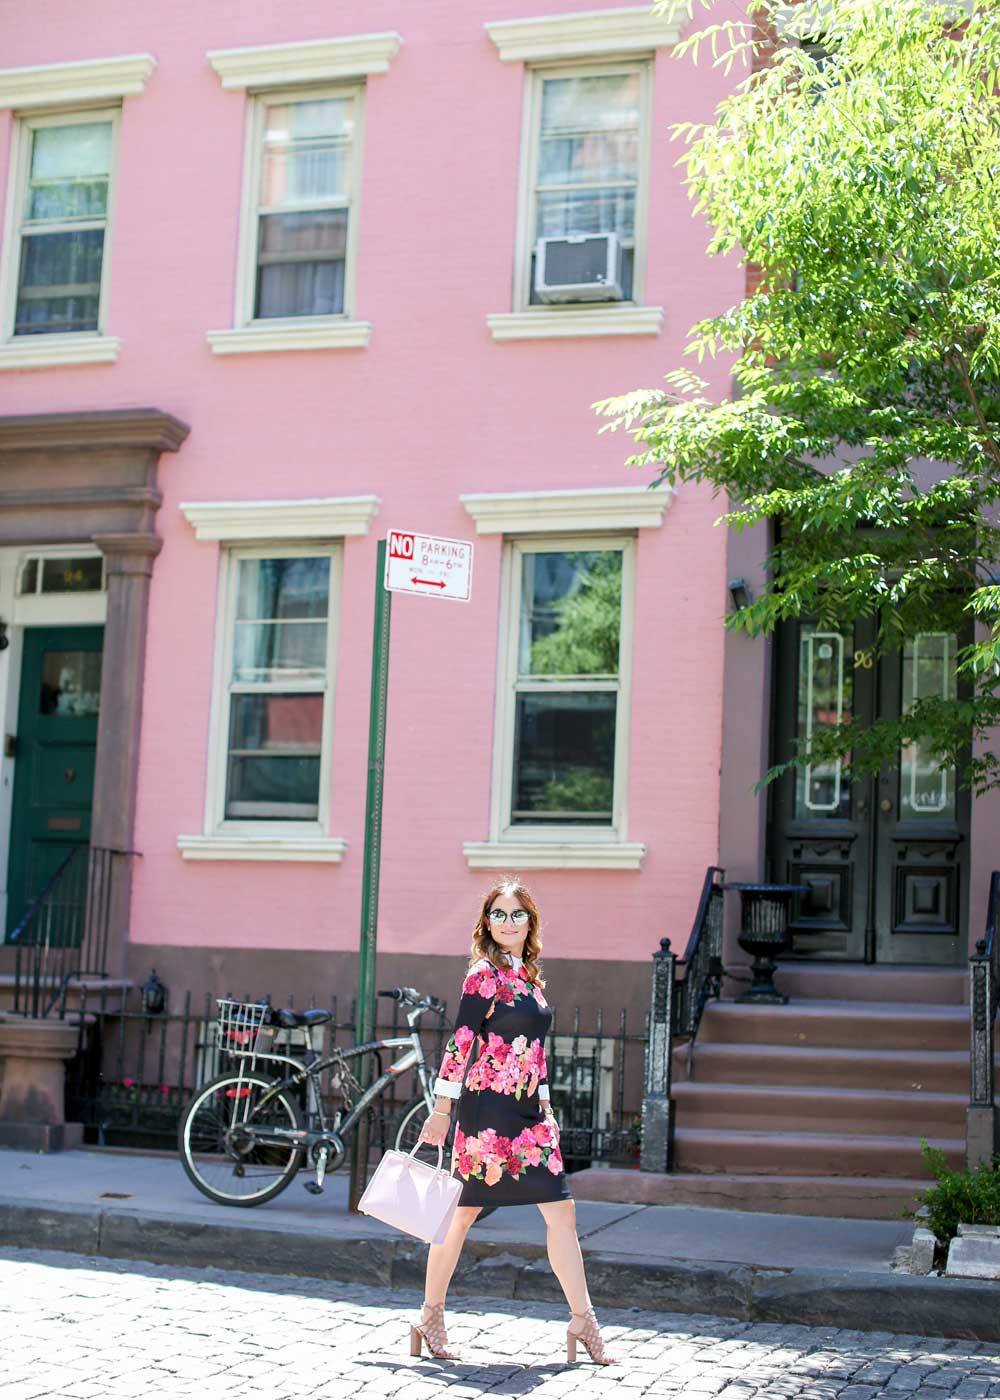 New York Pink Houses